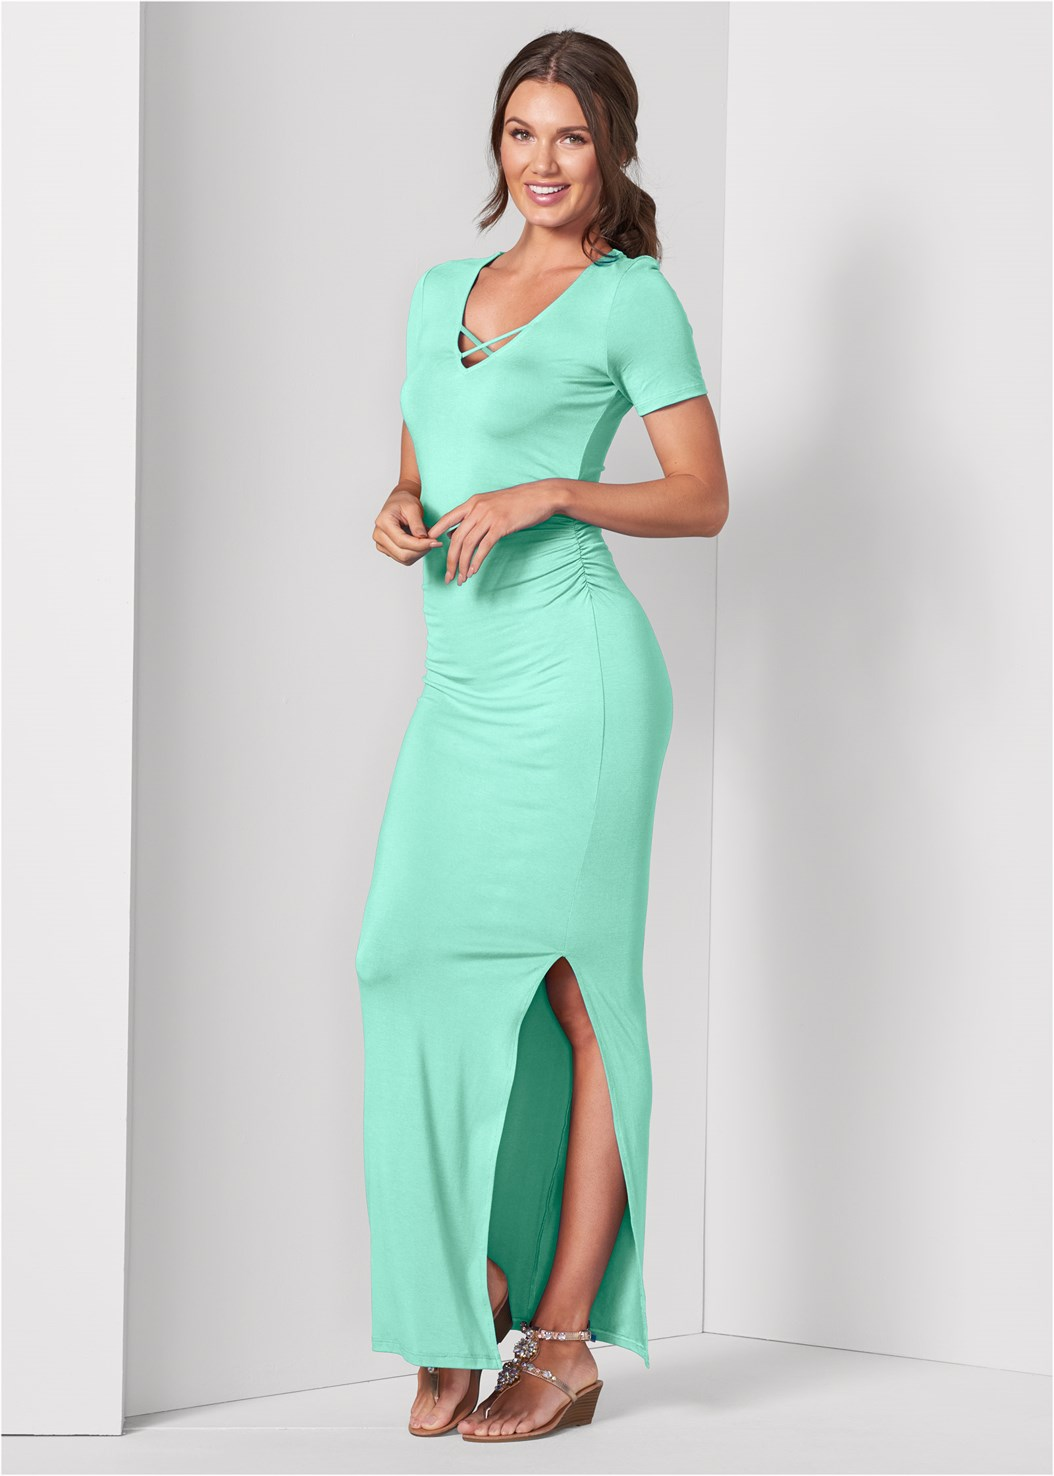 Ruched Maxi Dress,Naked T-Shirt Bra,Embellished Low Wedges